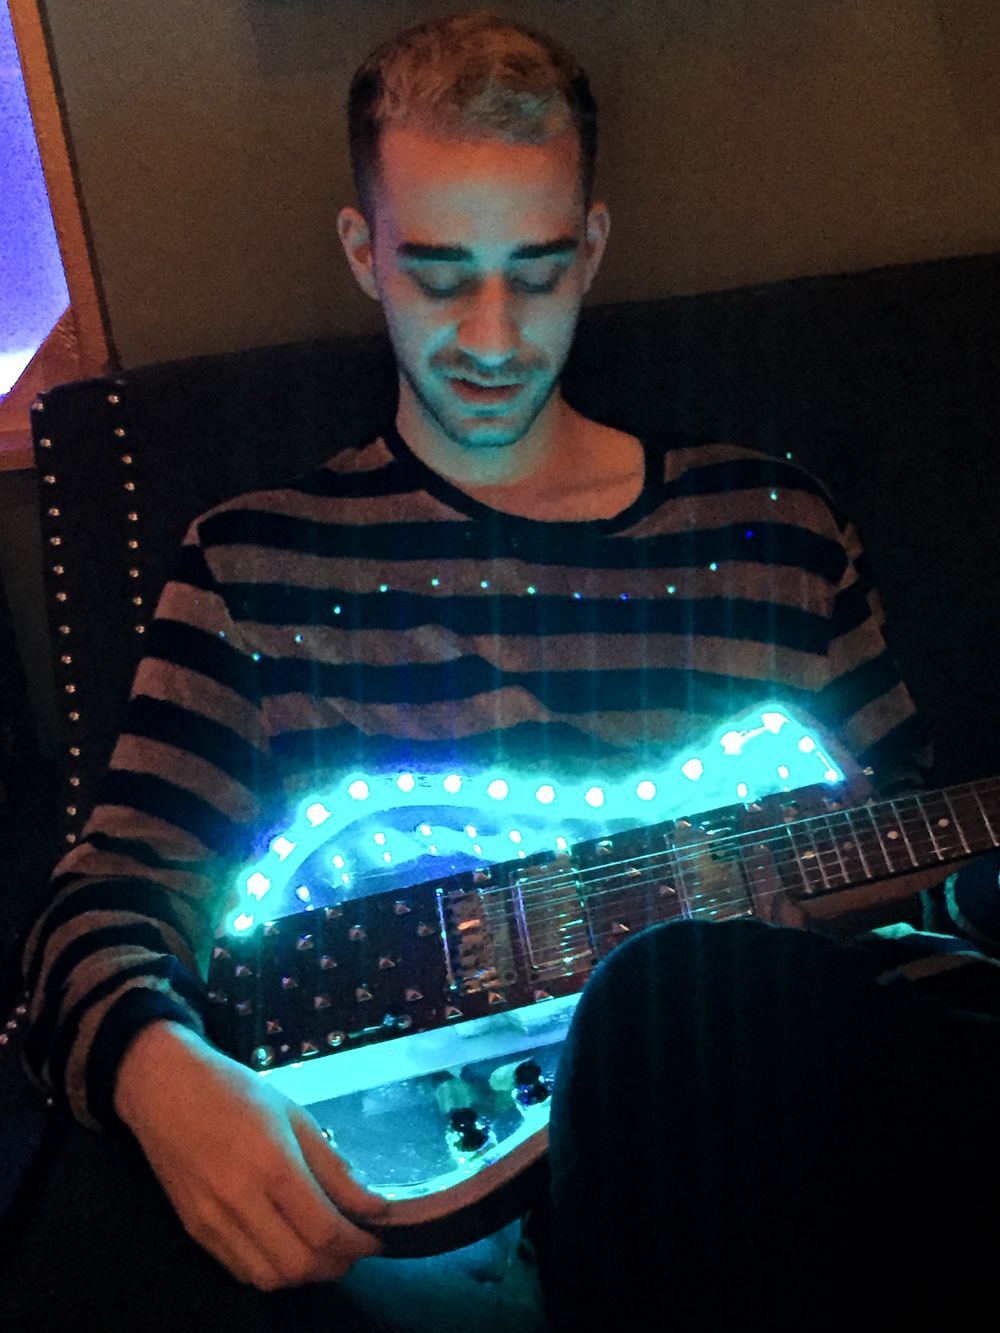 NICHOLAS VEINOGLOUBAZZI - Image courtesy of Gallo Guitars